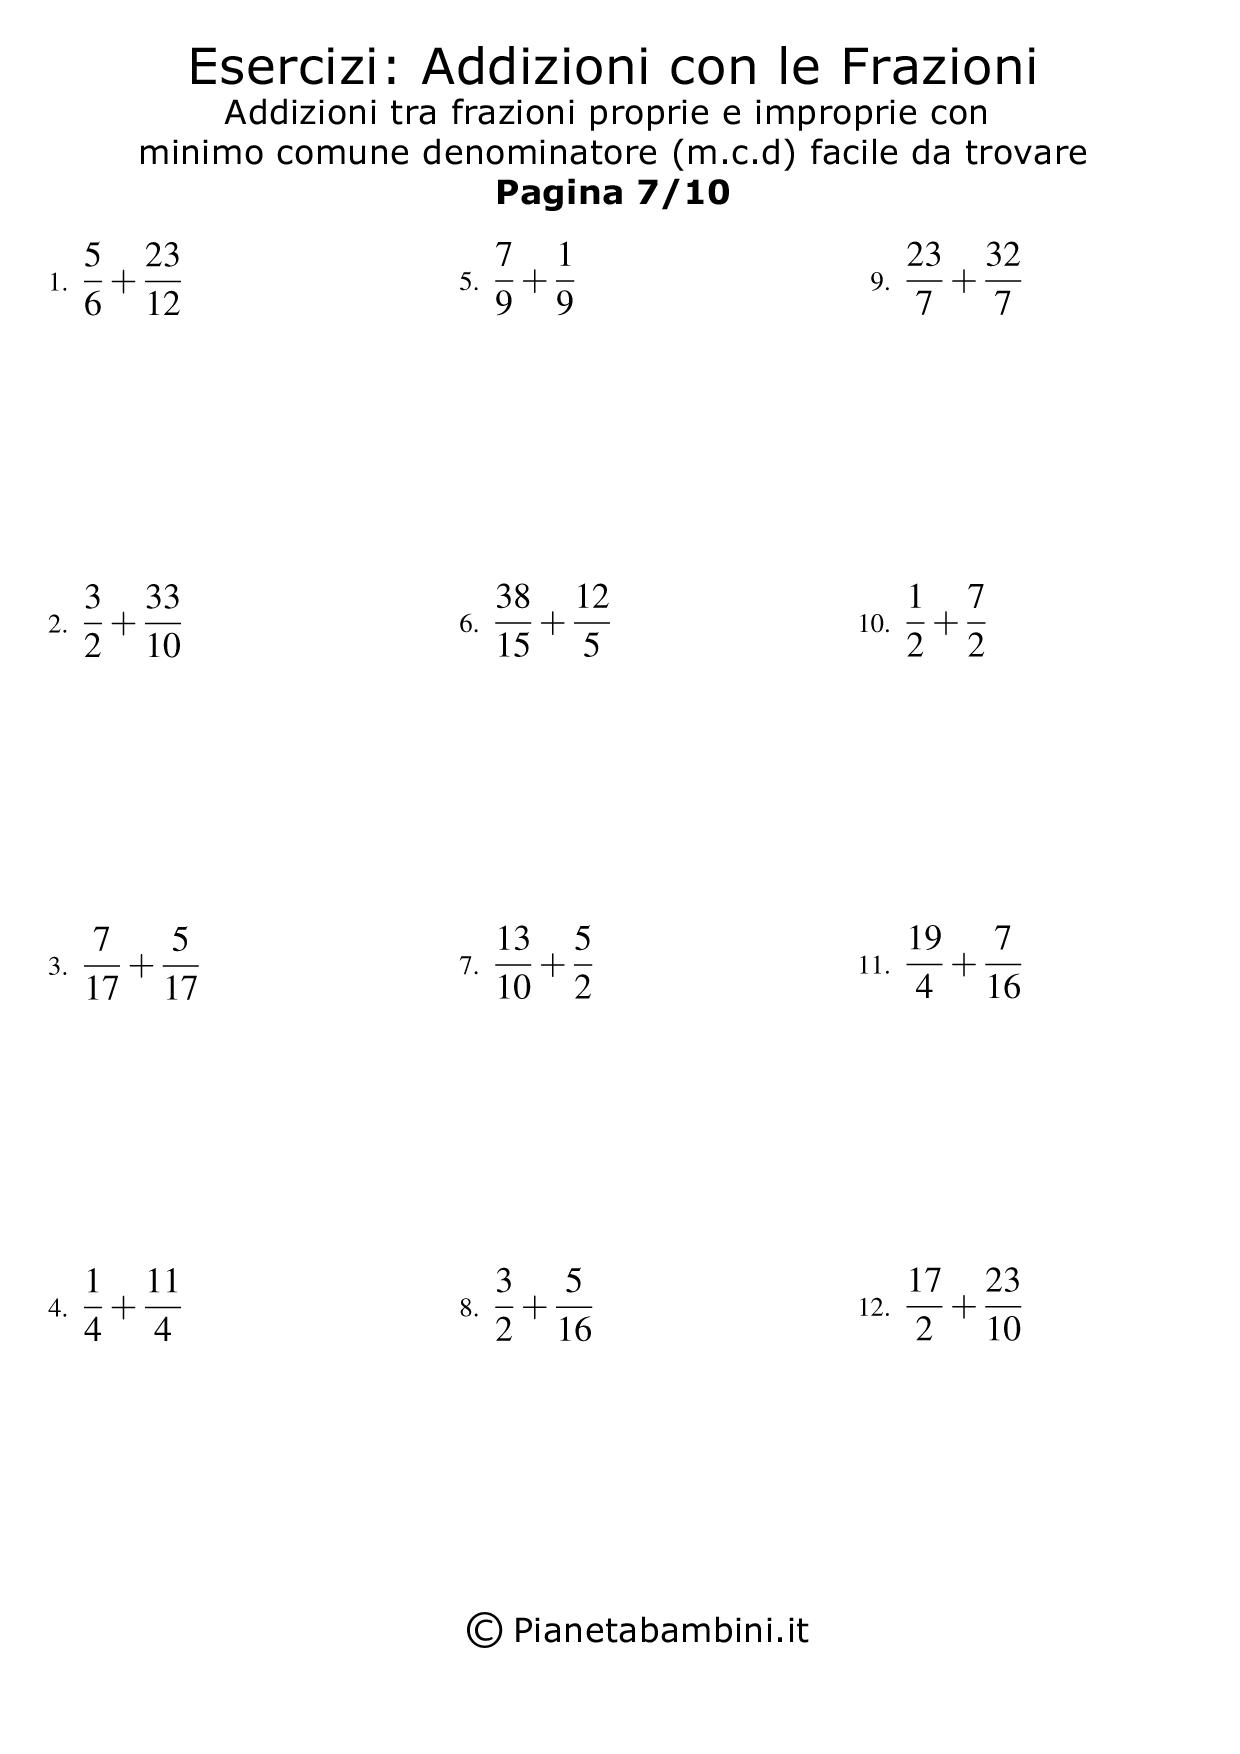 Frazioni-Prorpie-Improprie-m.c.d-Facile_07